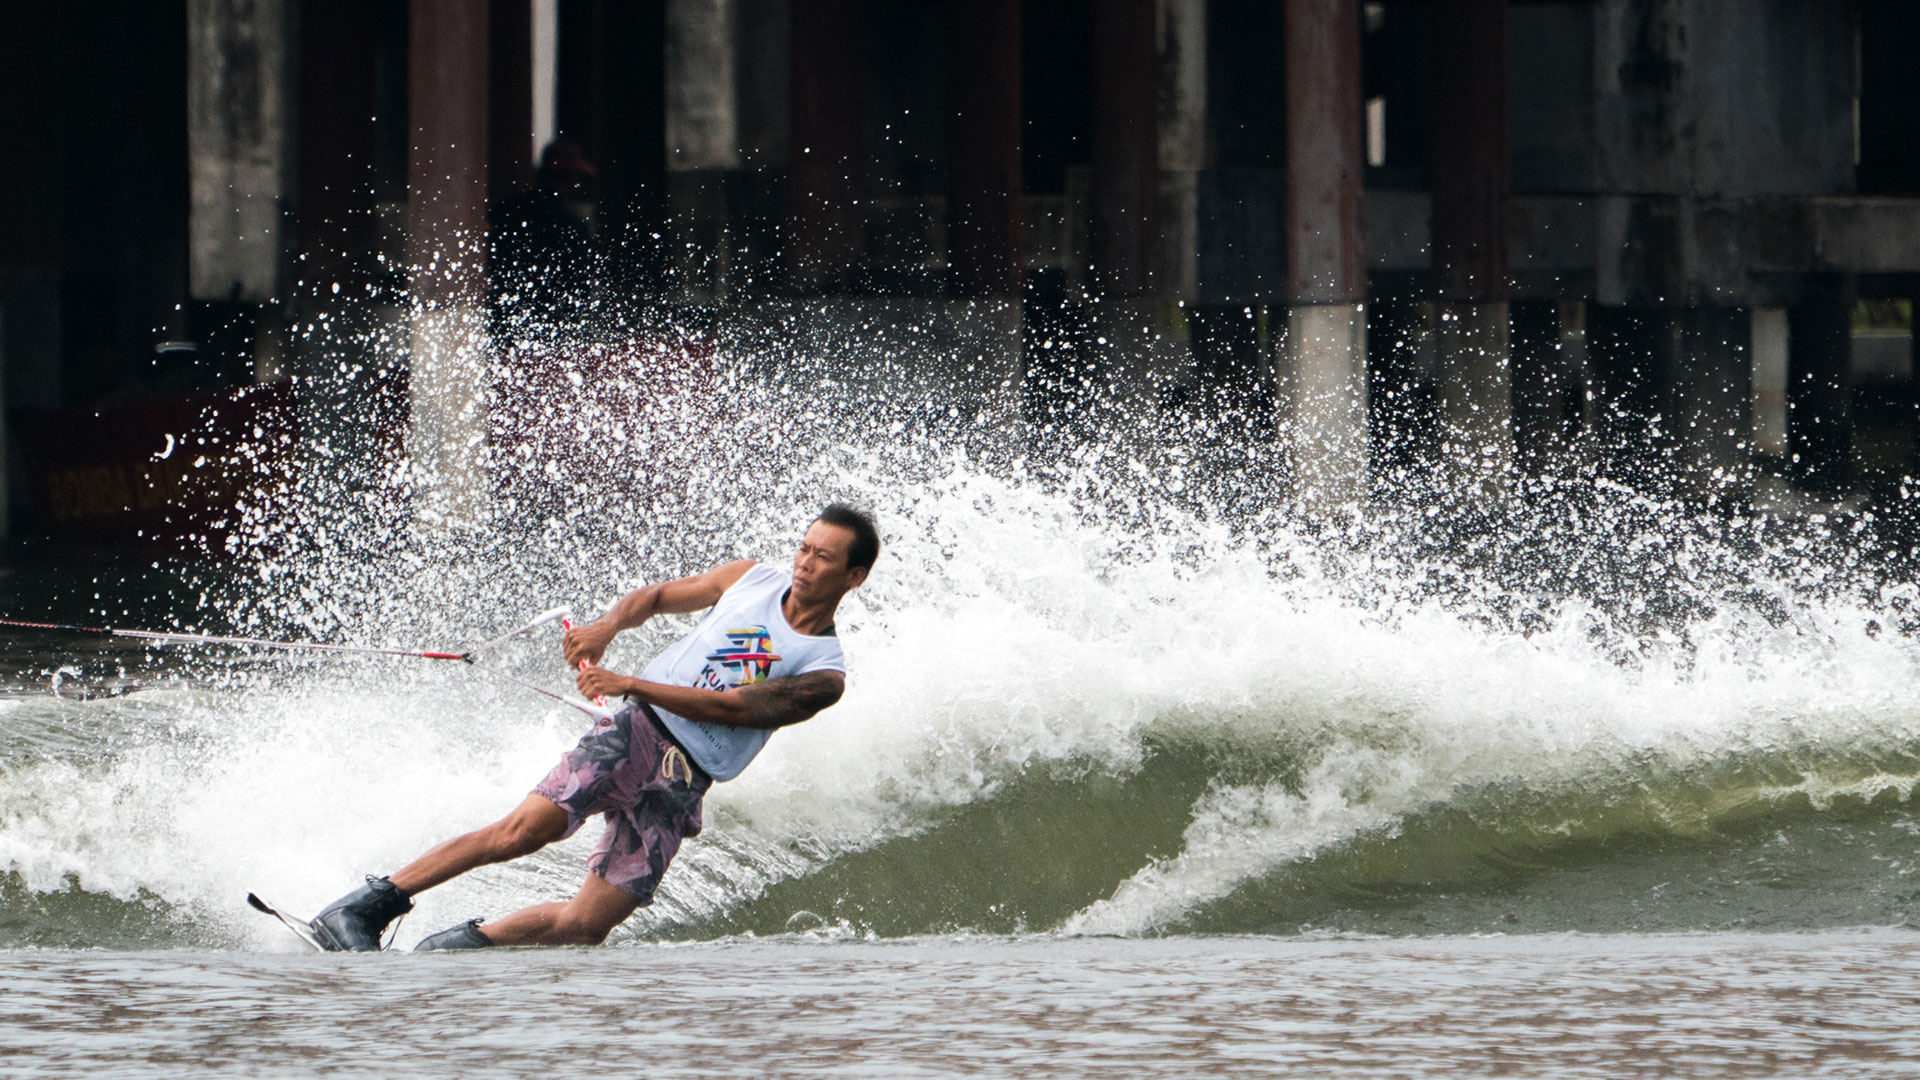 Frankie wakeboarding